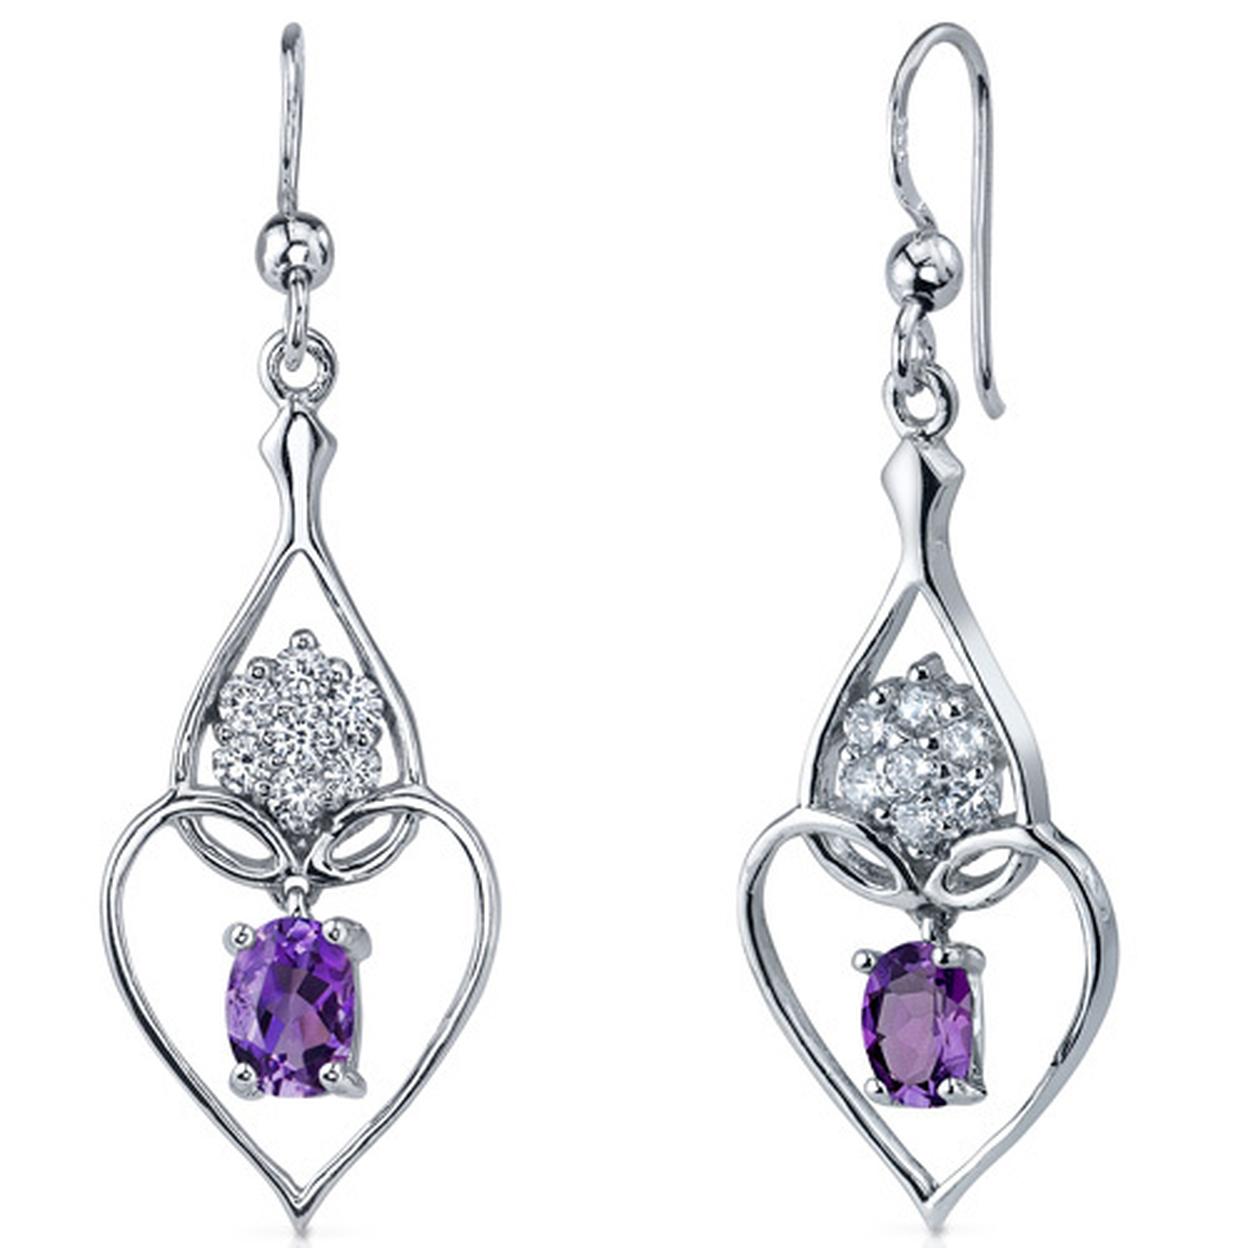 Illuminating Hearts 1.50 Carats Amethyst Oval Cut Dangle Cz Earrings In Sterling Silver Style Se7258